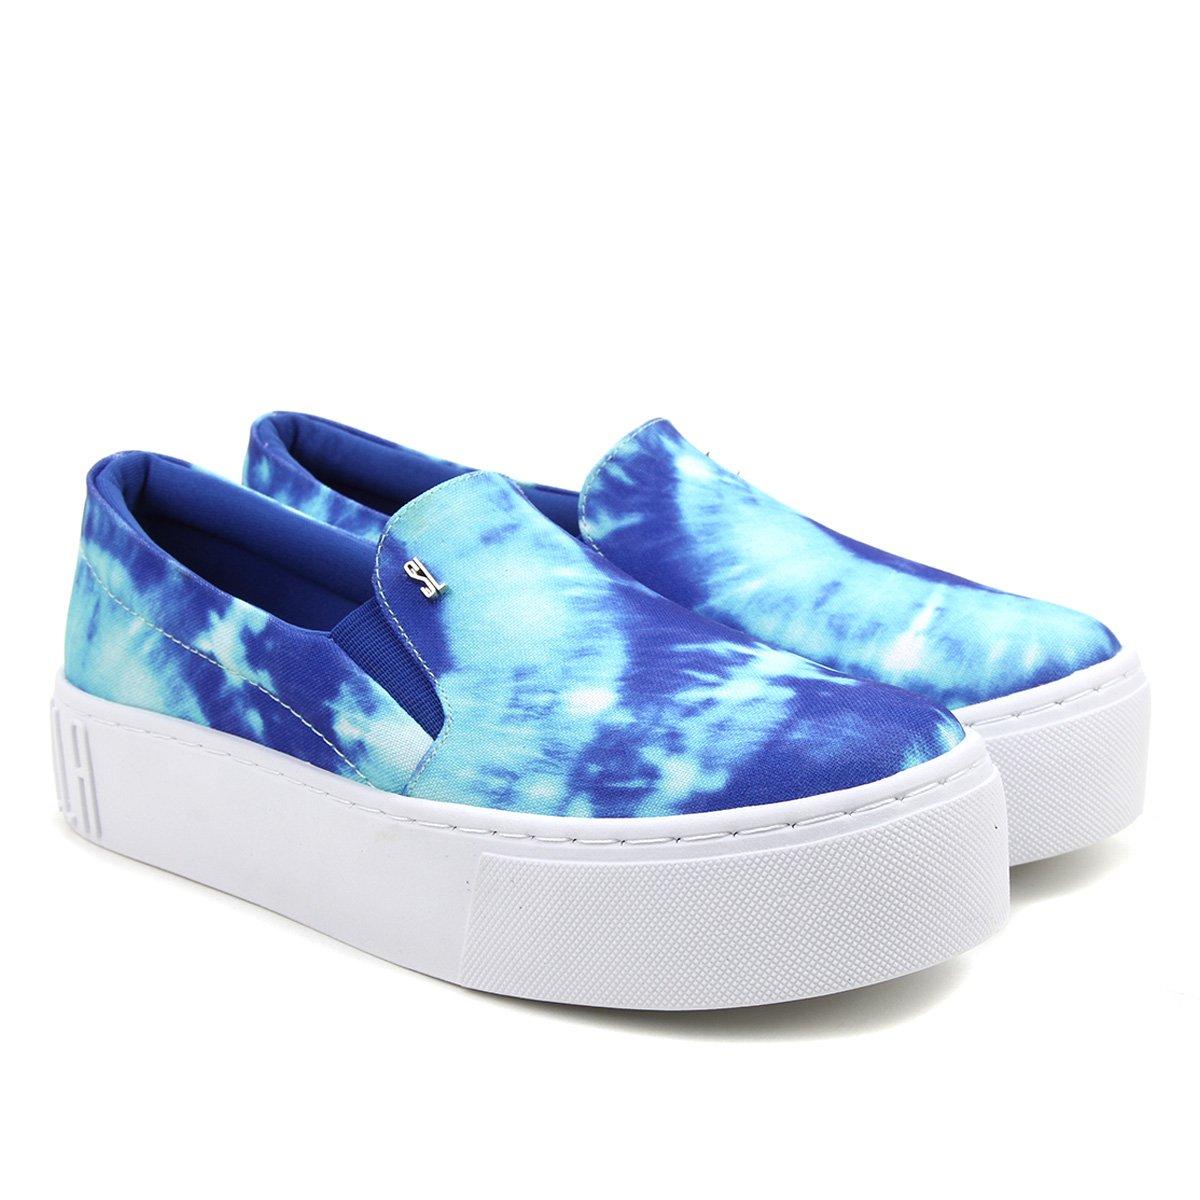 Slip On Santa Lolla Tie Dye Lona Feminino - Azul